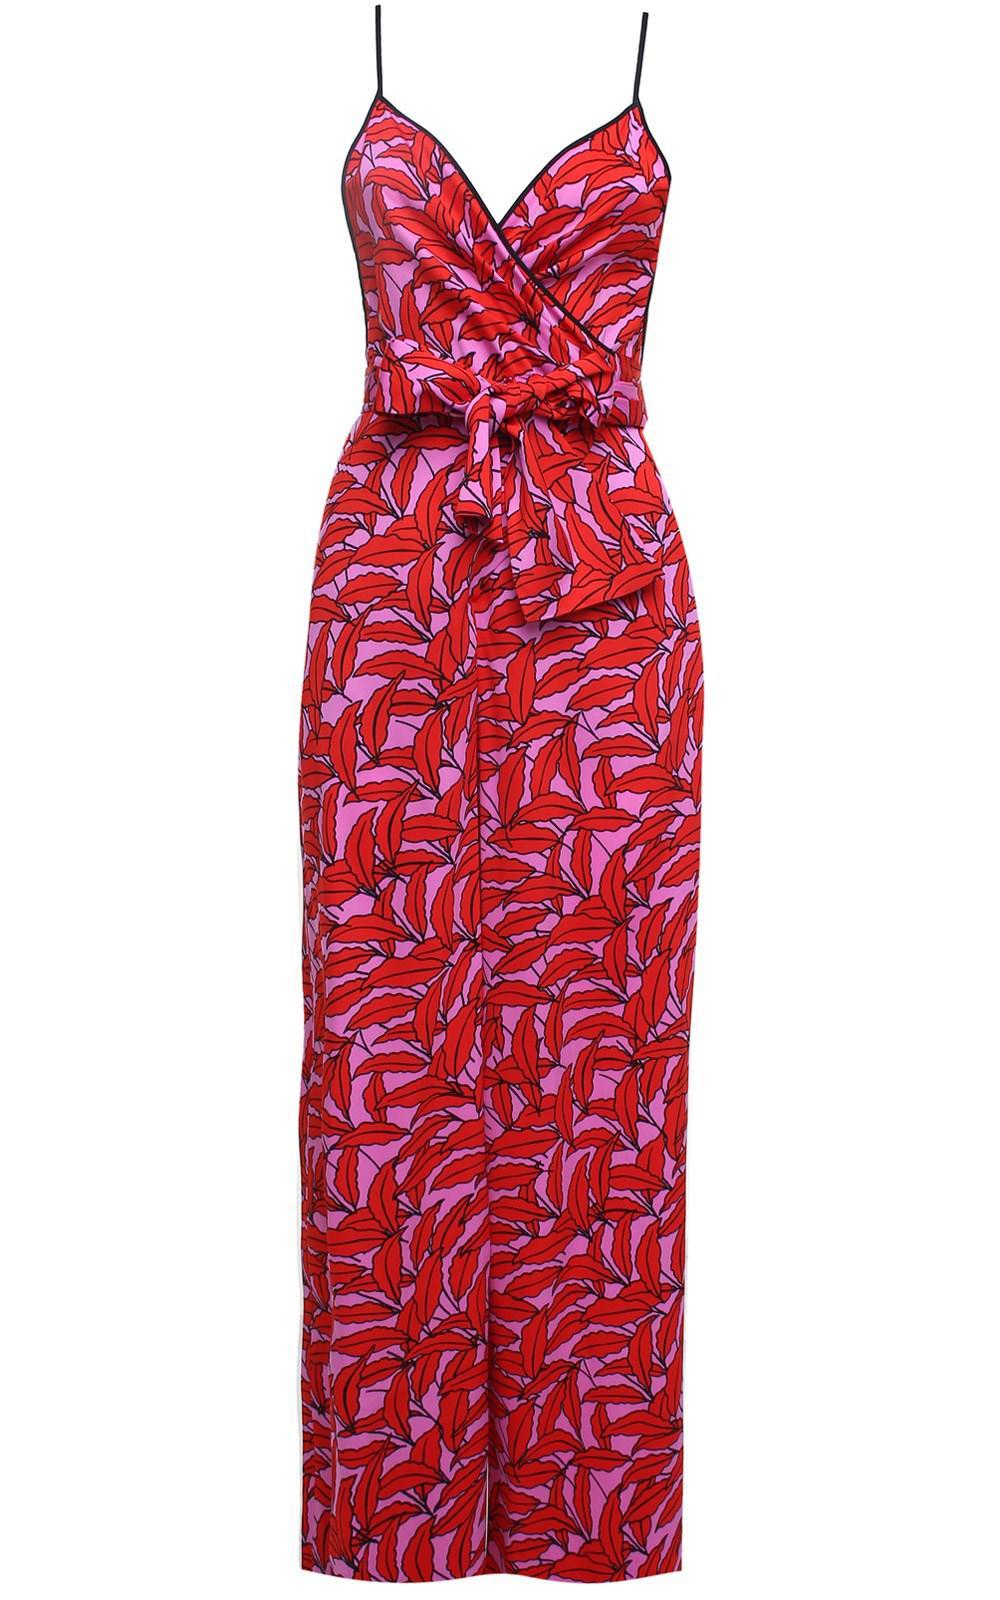 b3a6d4066cd Diane von Furstenberg. Women s Red Barry Windsor Palm-print Viscose-blend  Jumpsuit